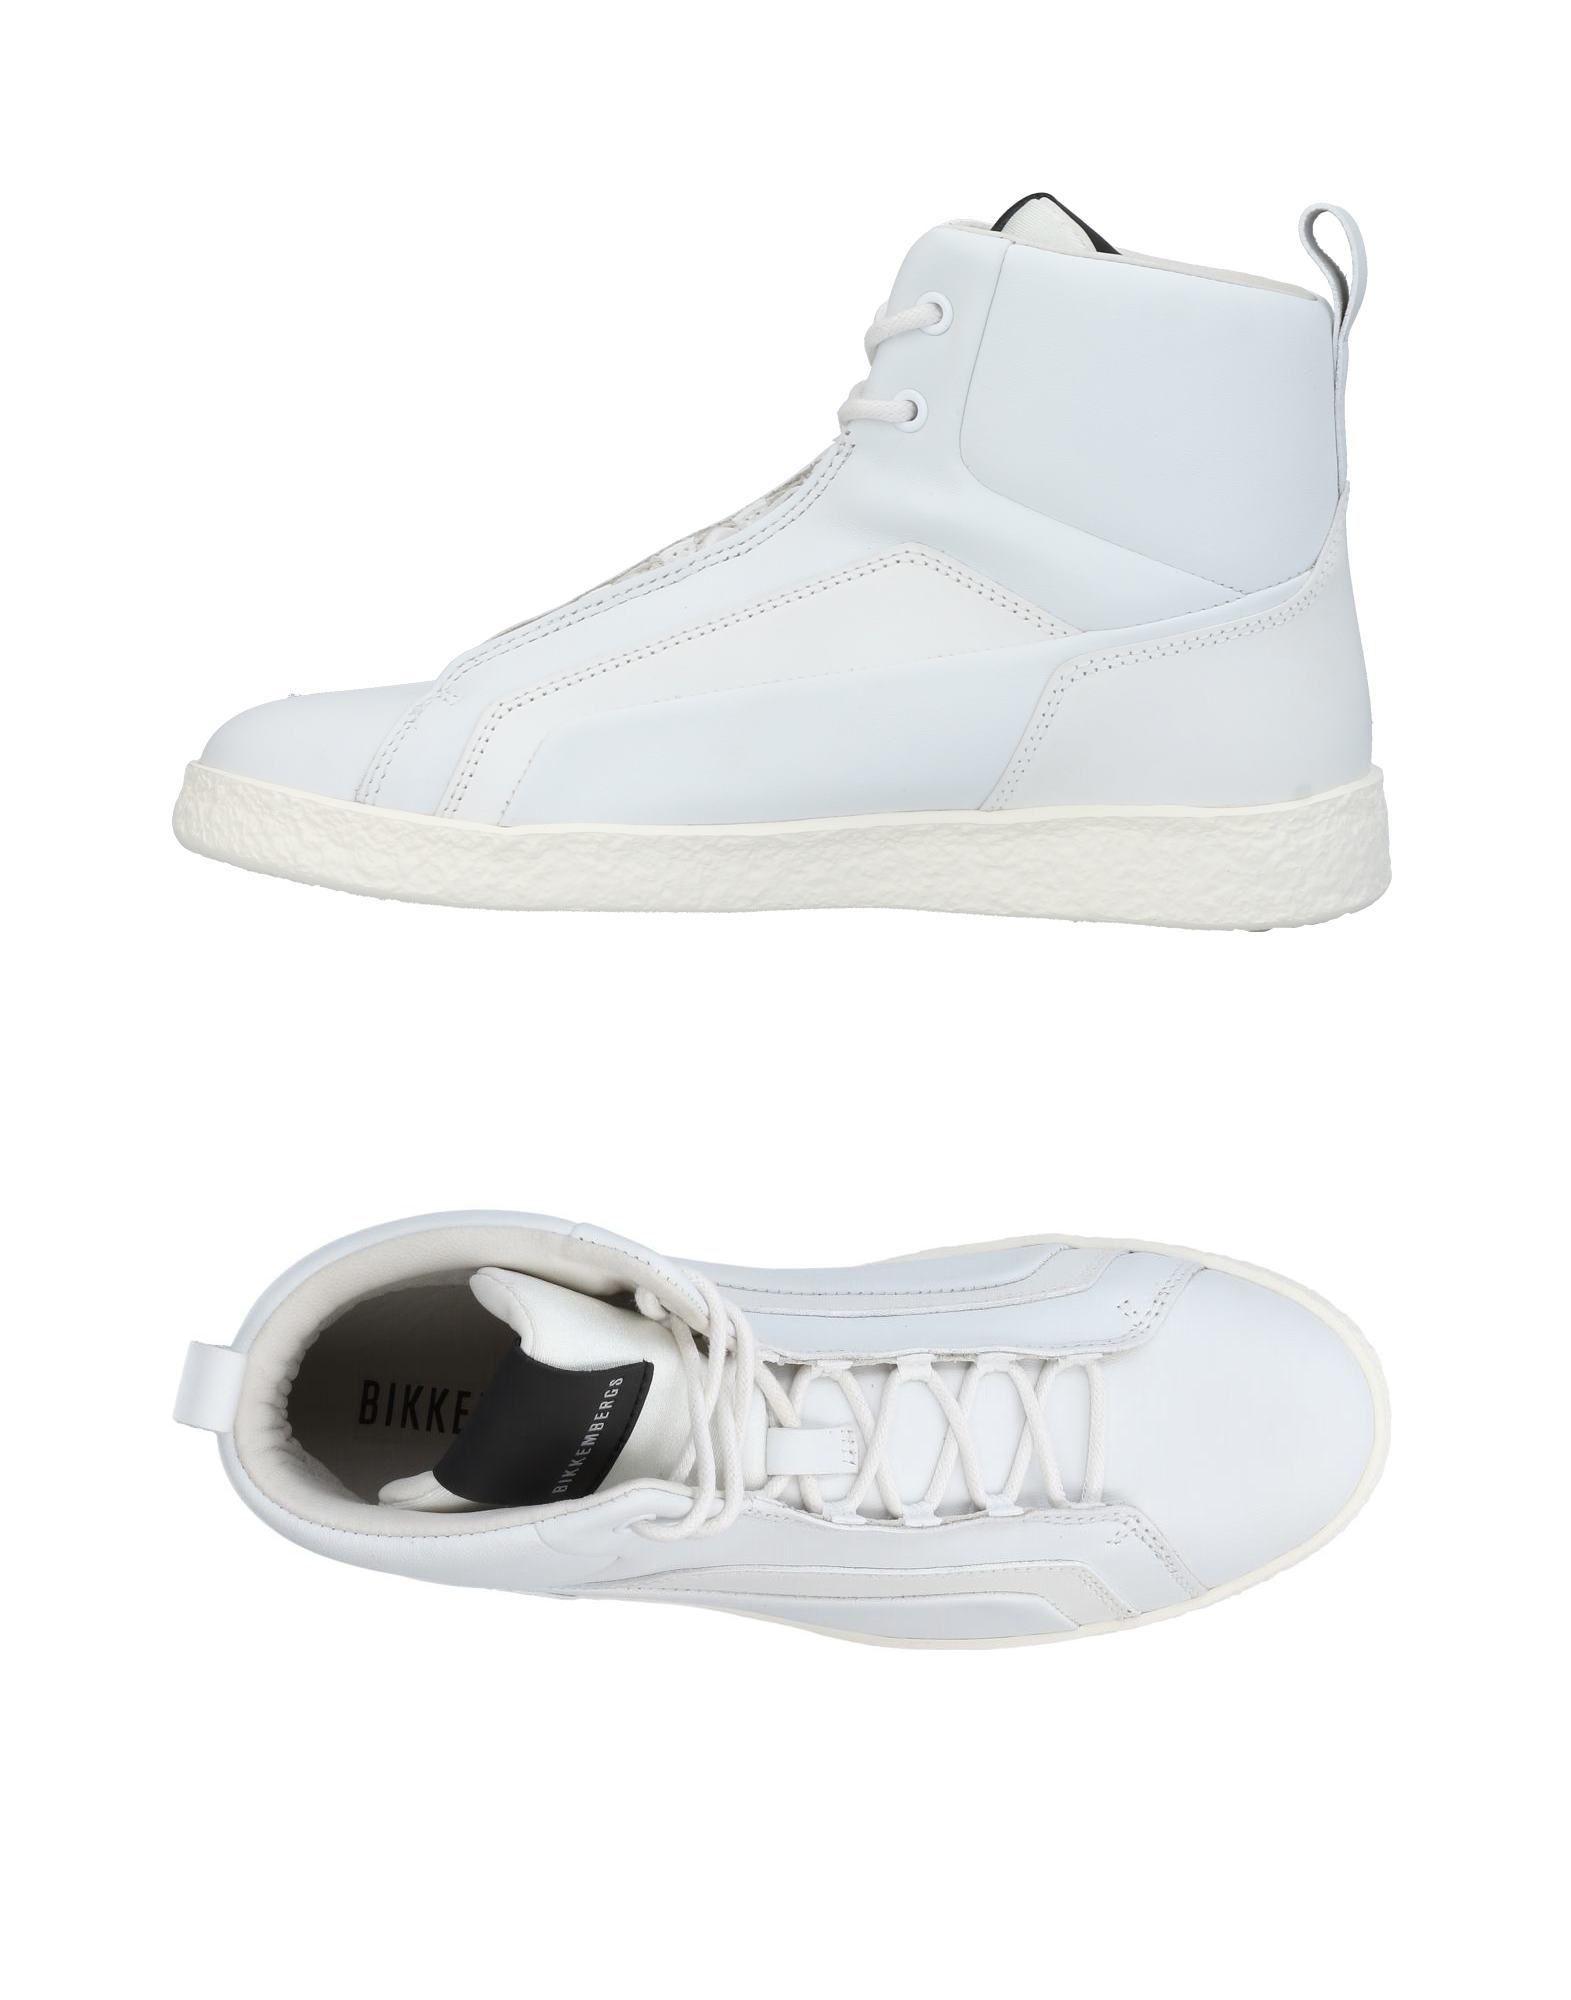 Stilvolle billige Schuhe Bikkembergs Sneakers Damen  11451108CD